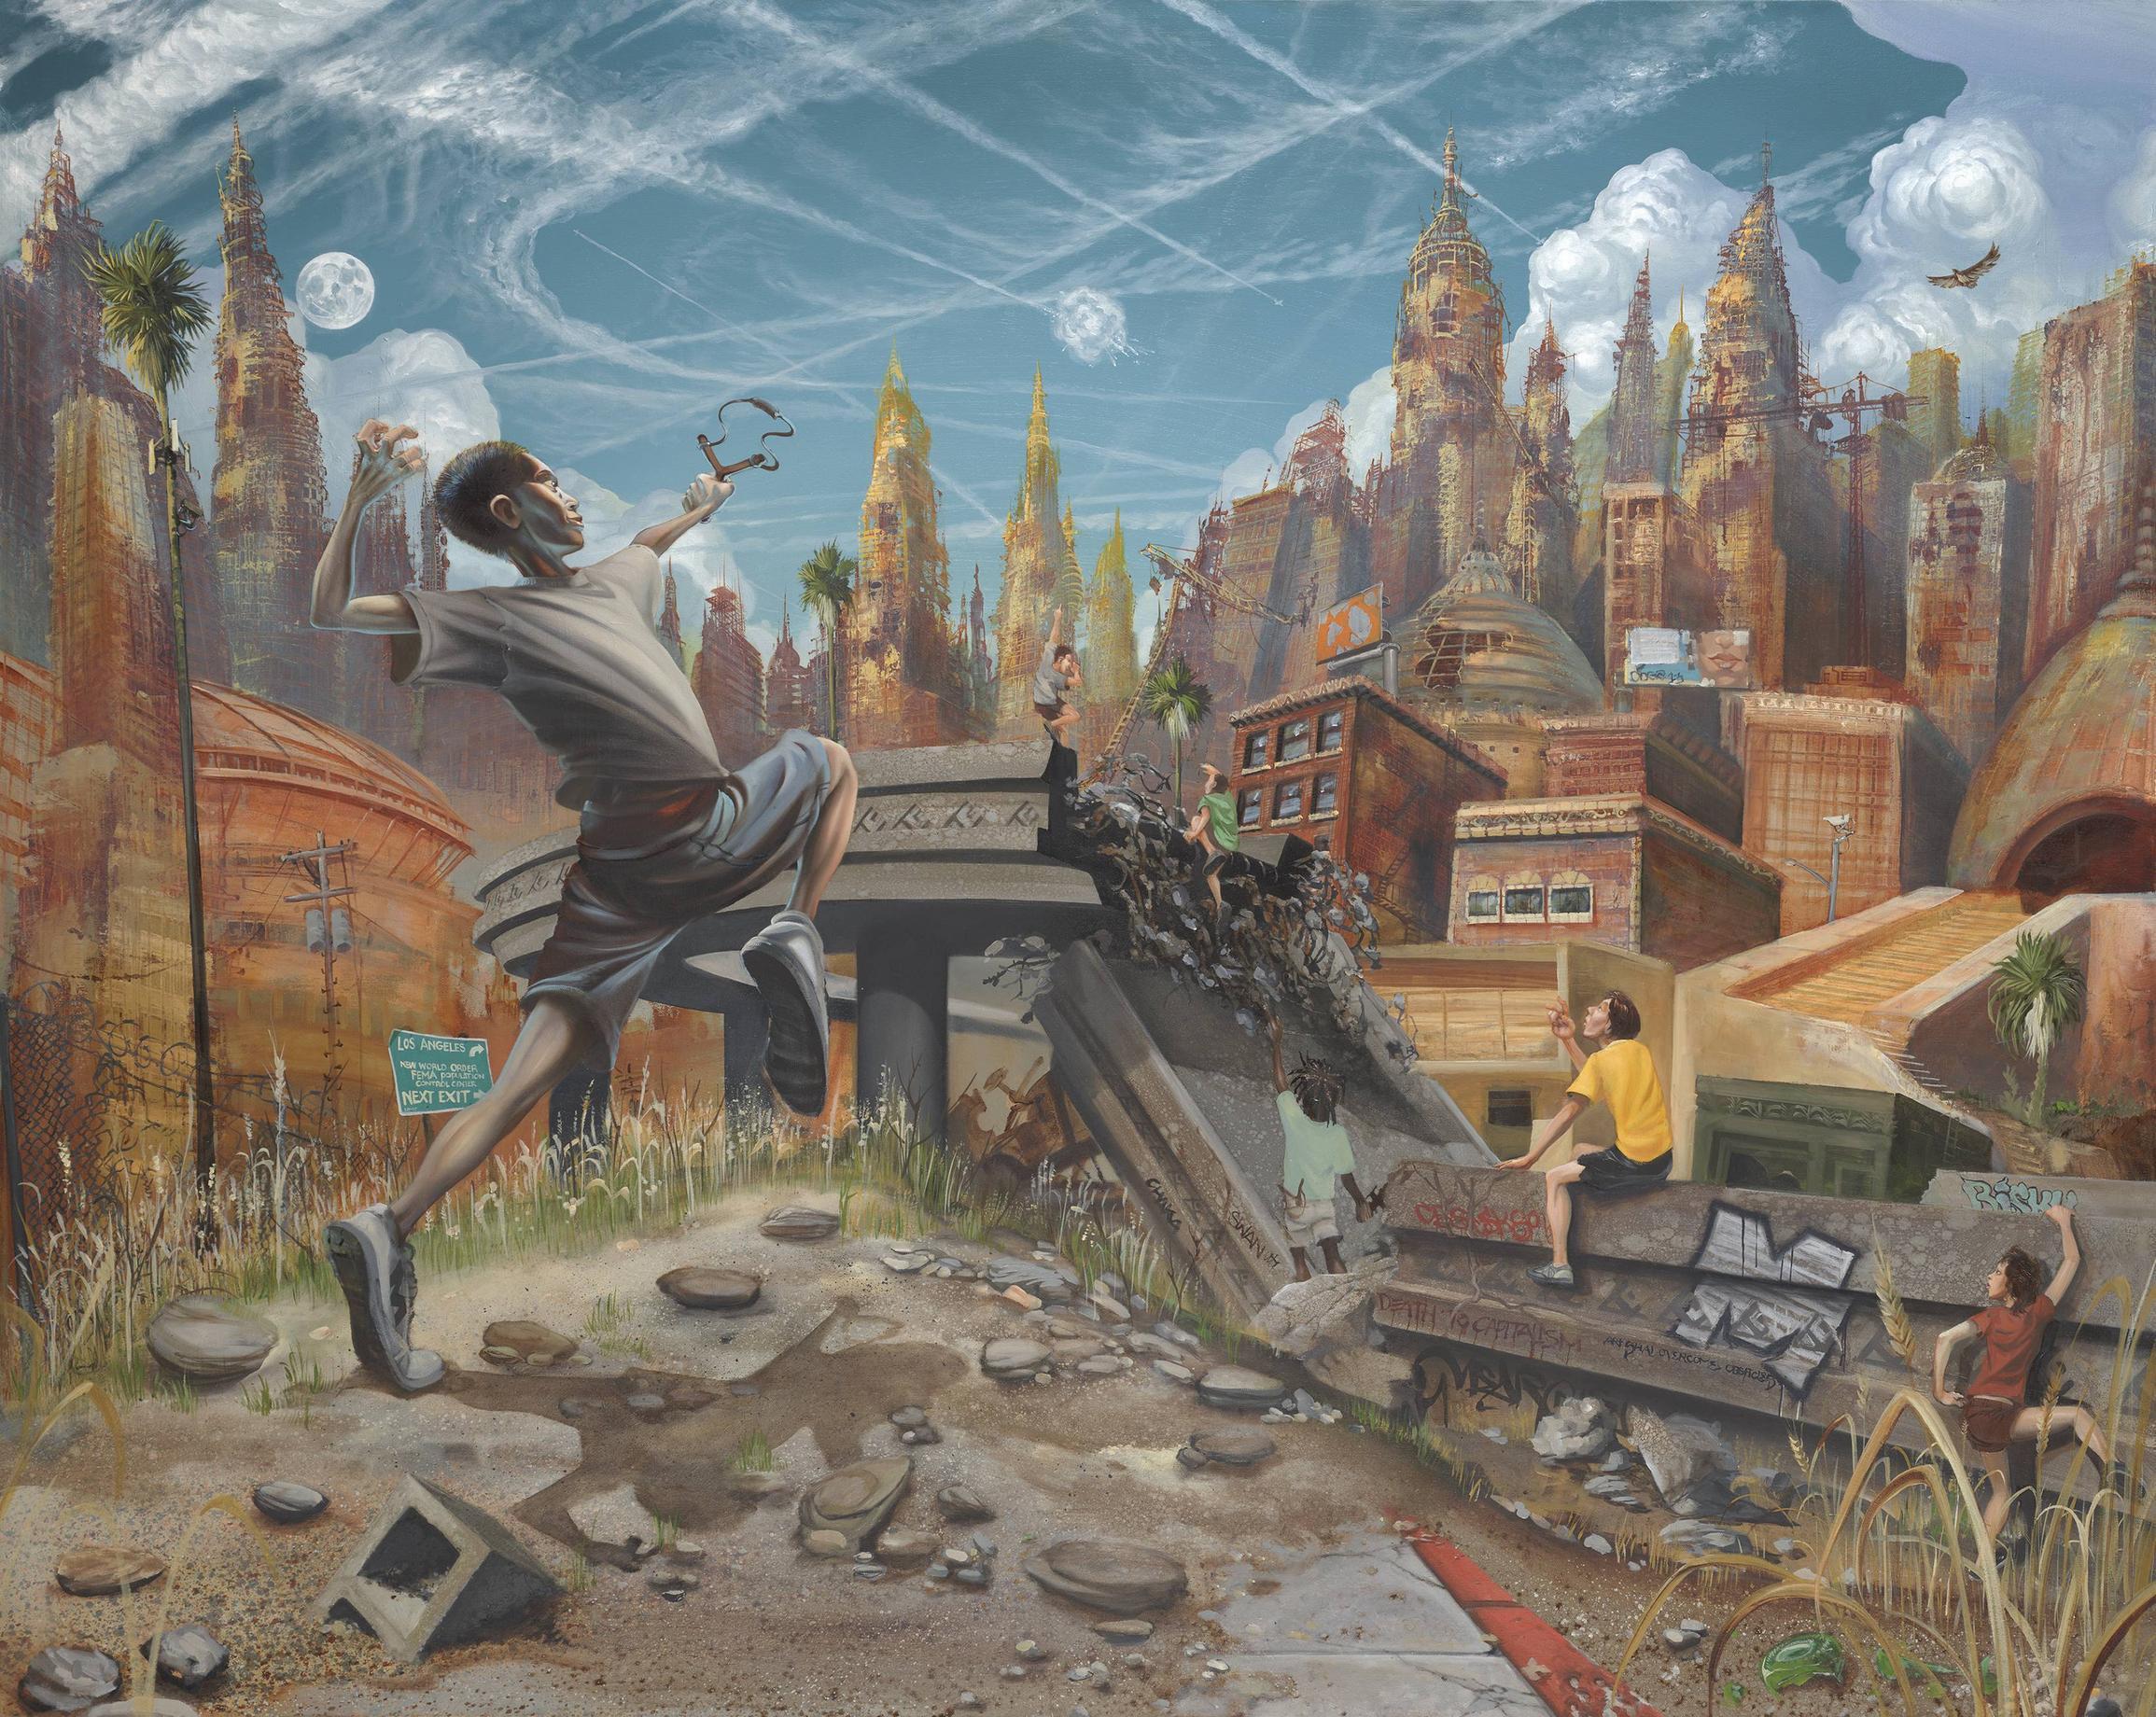 Freeport - David & Goliath 21/100